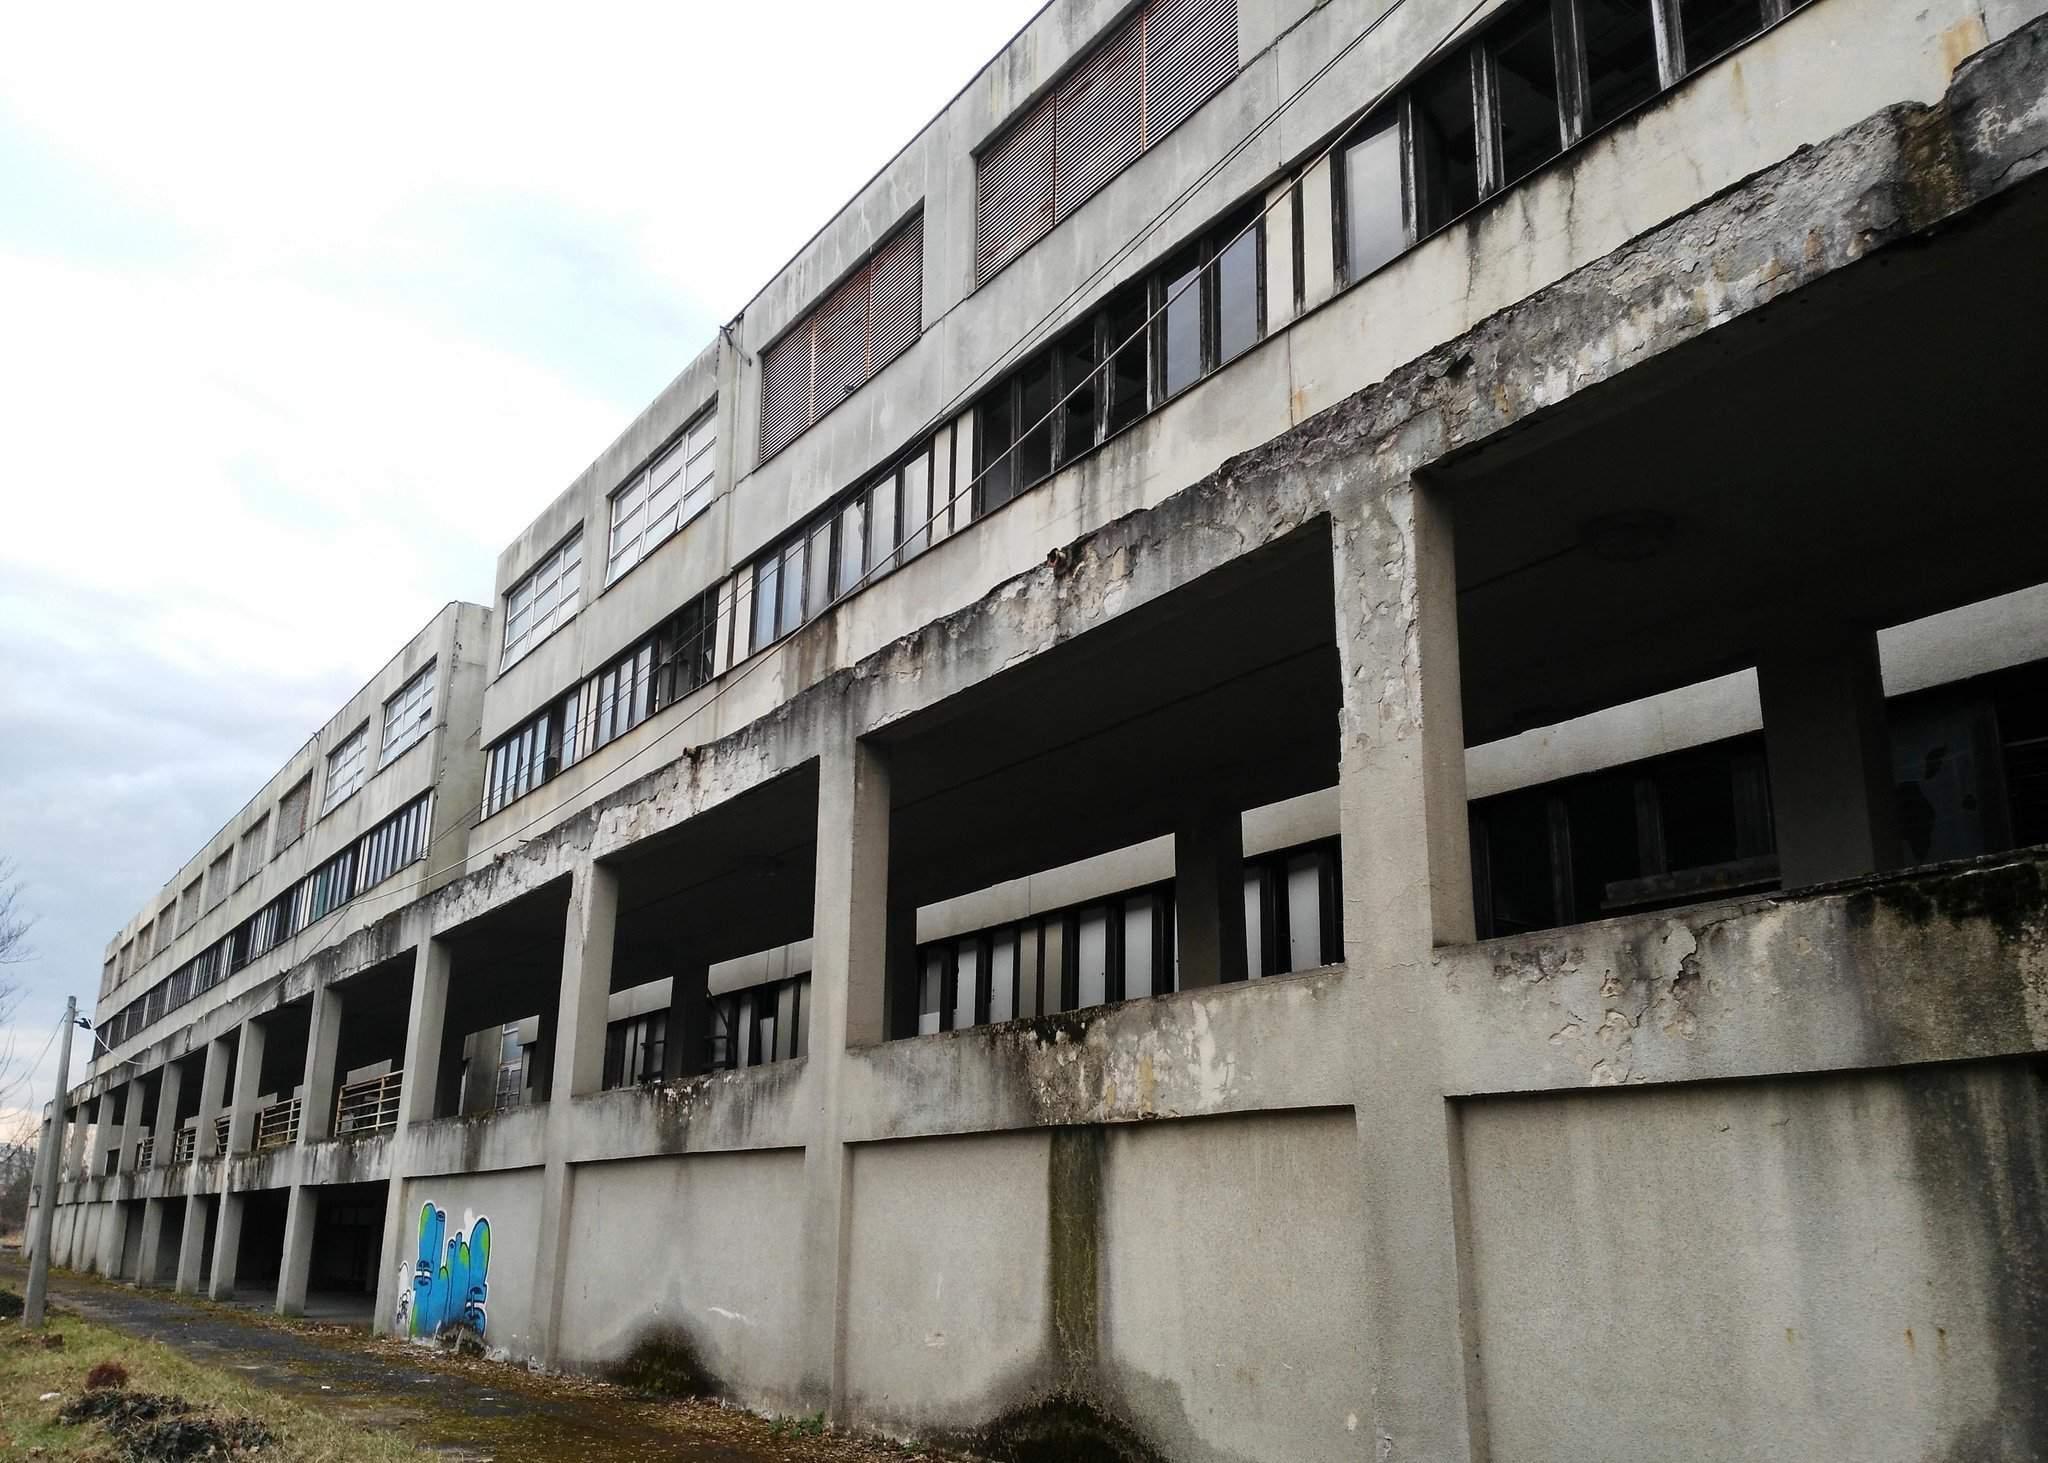 Hospital in Hungary